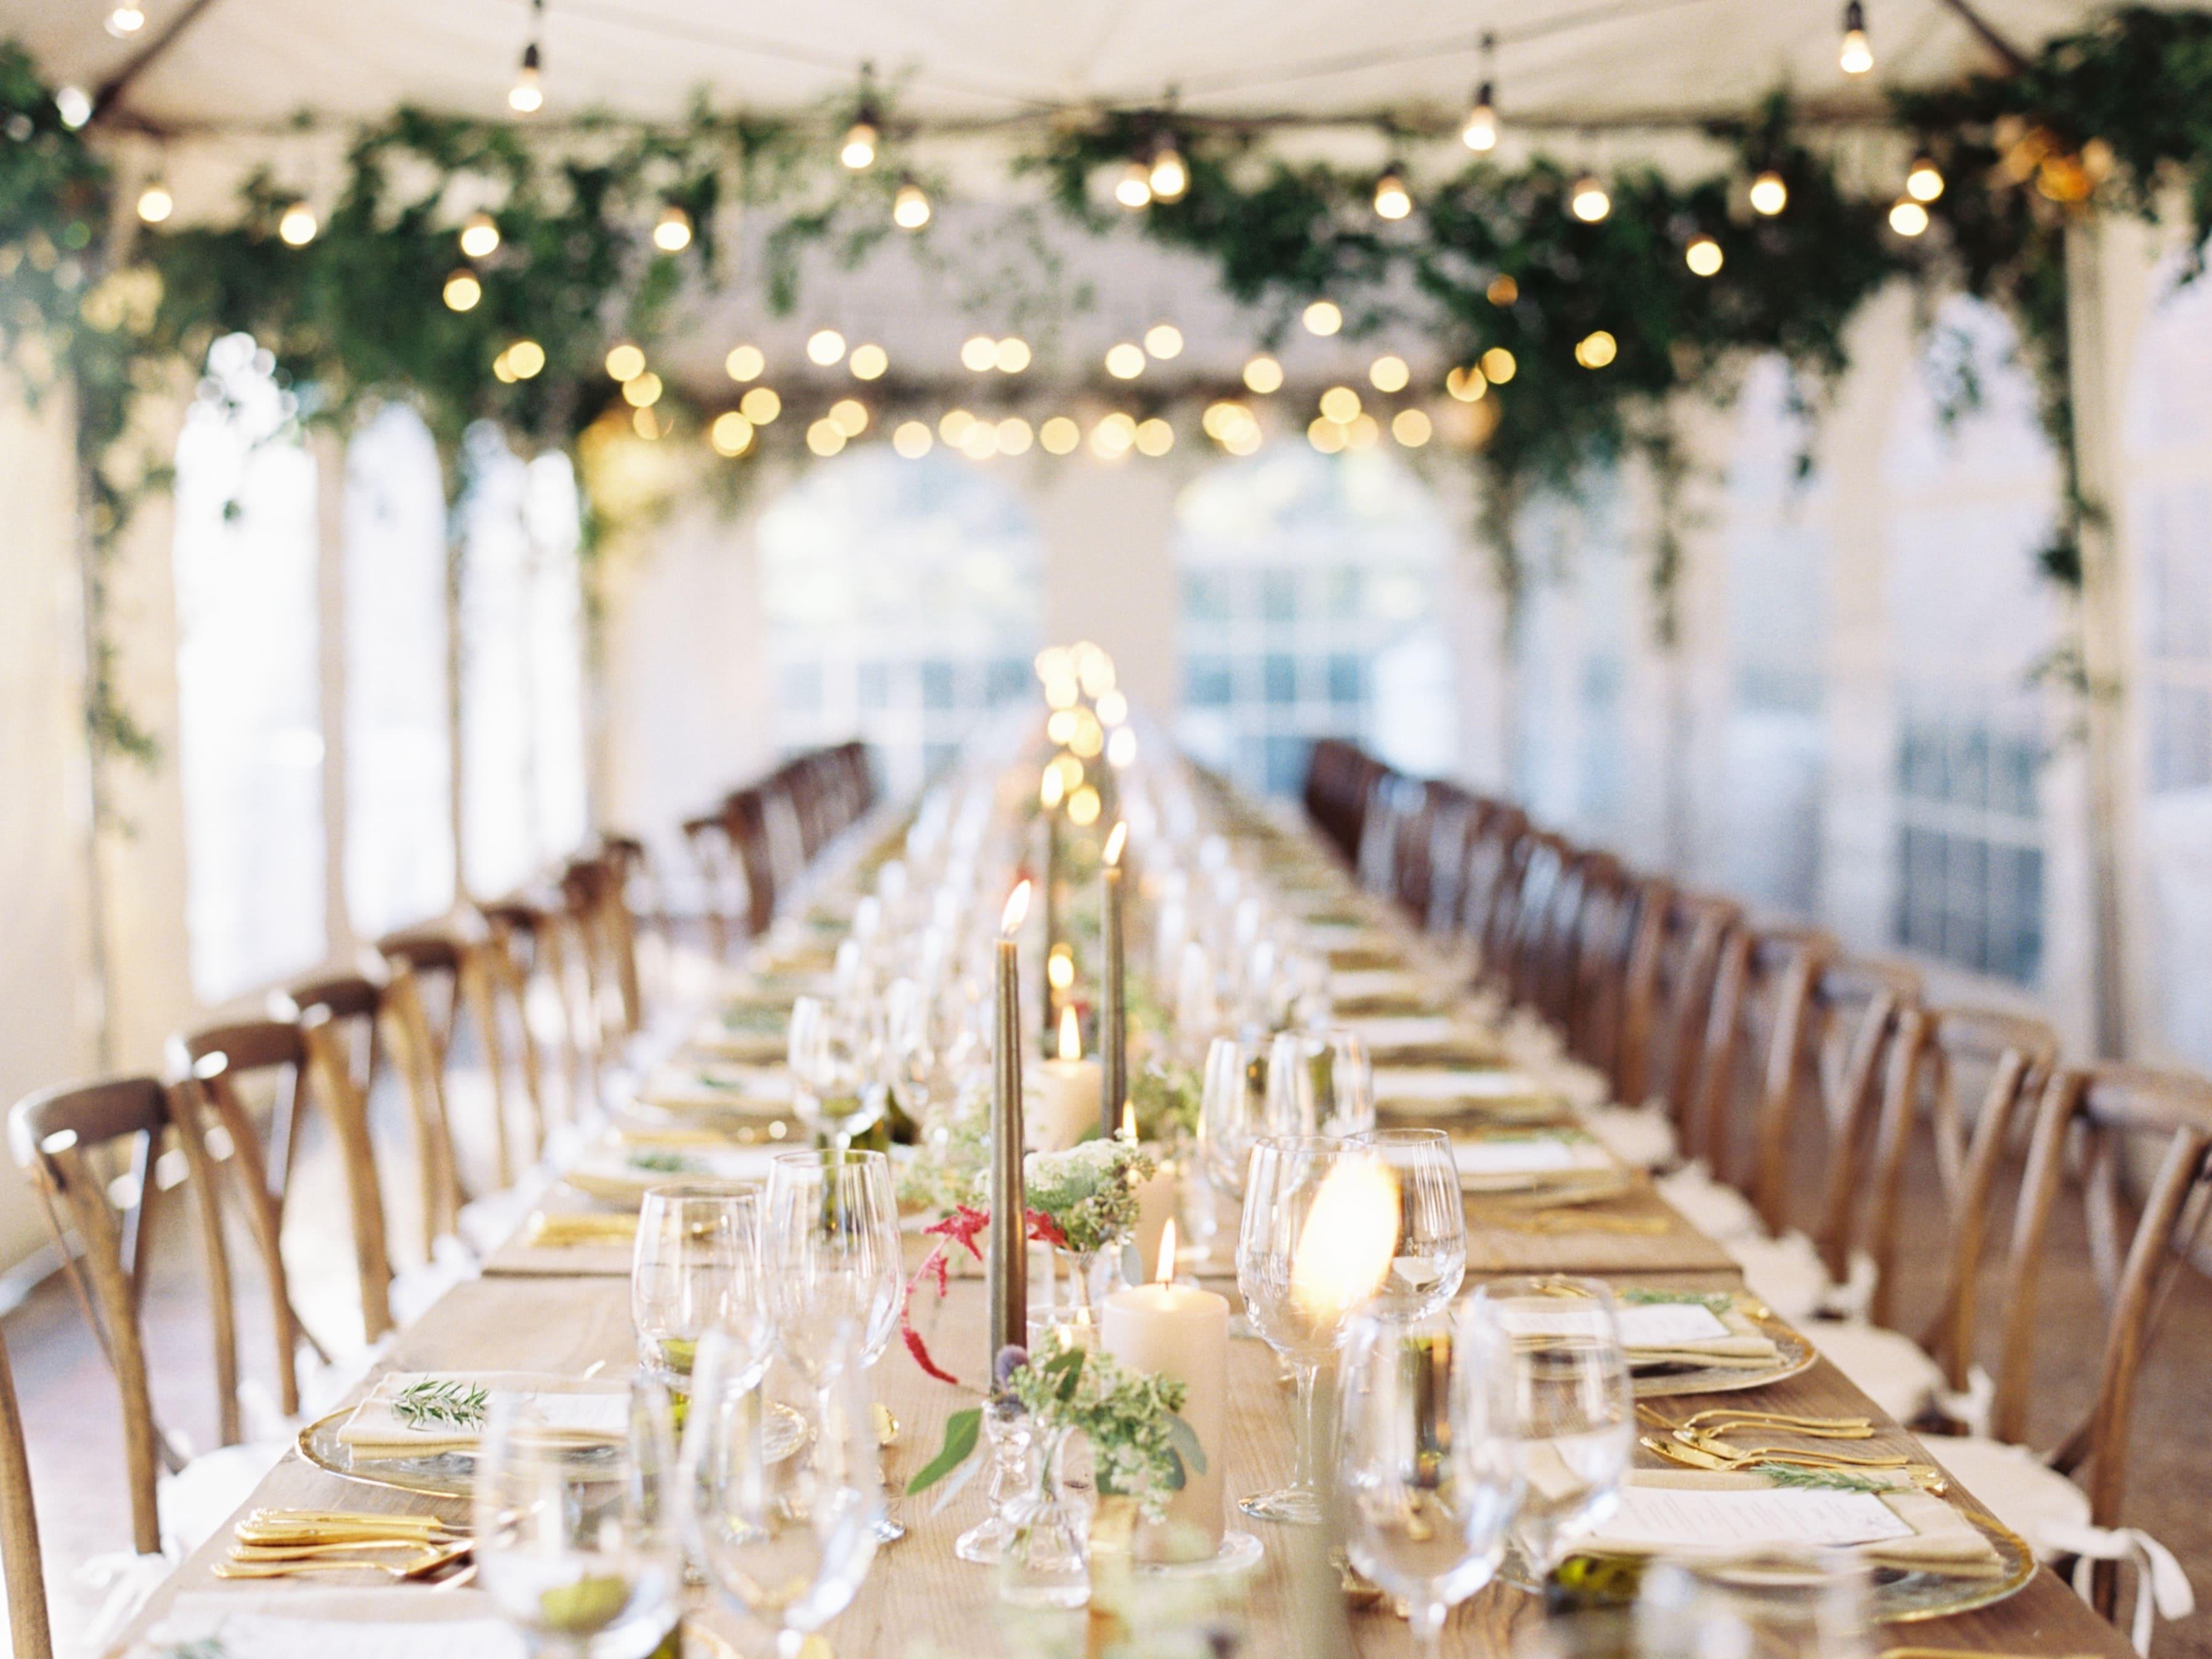 Casamento com Jantar Family Style